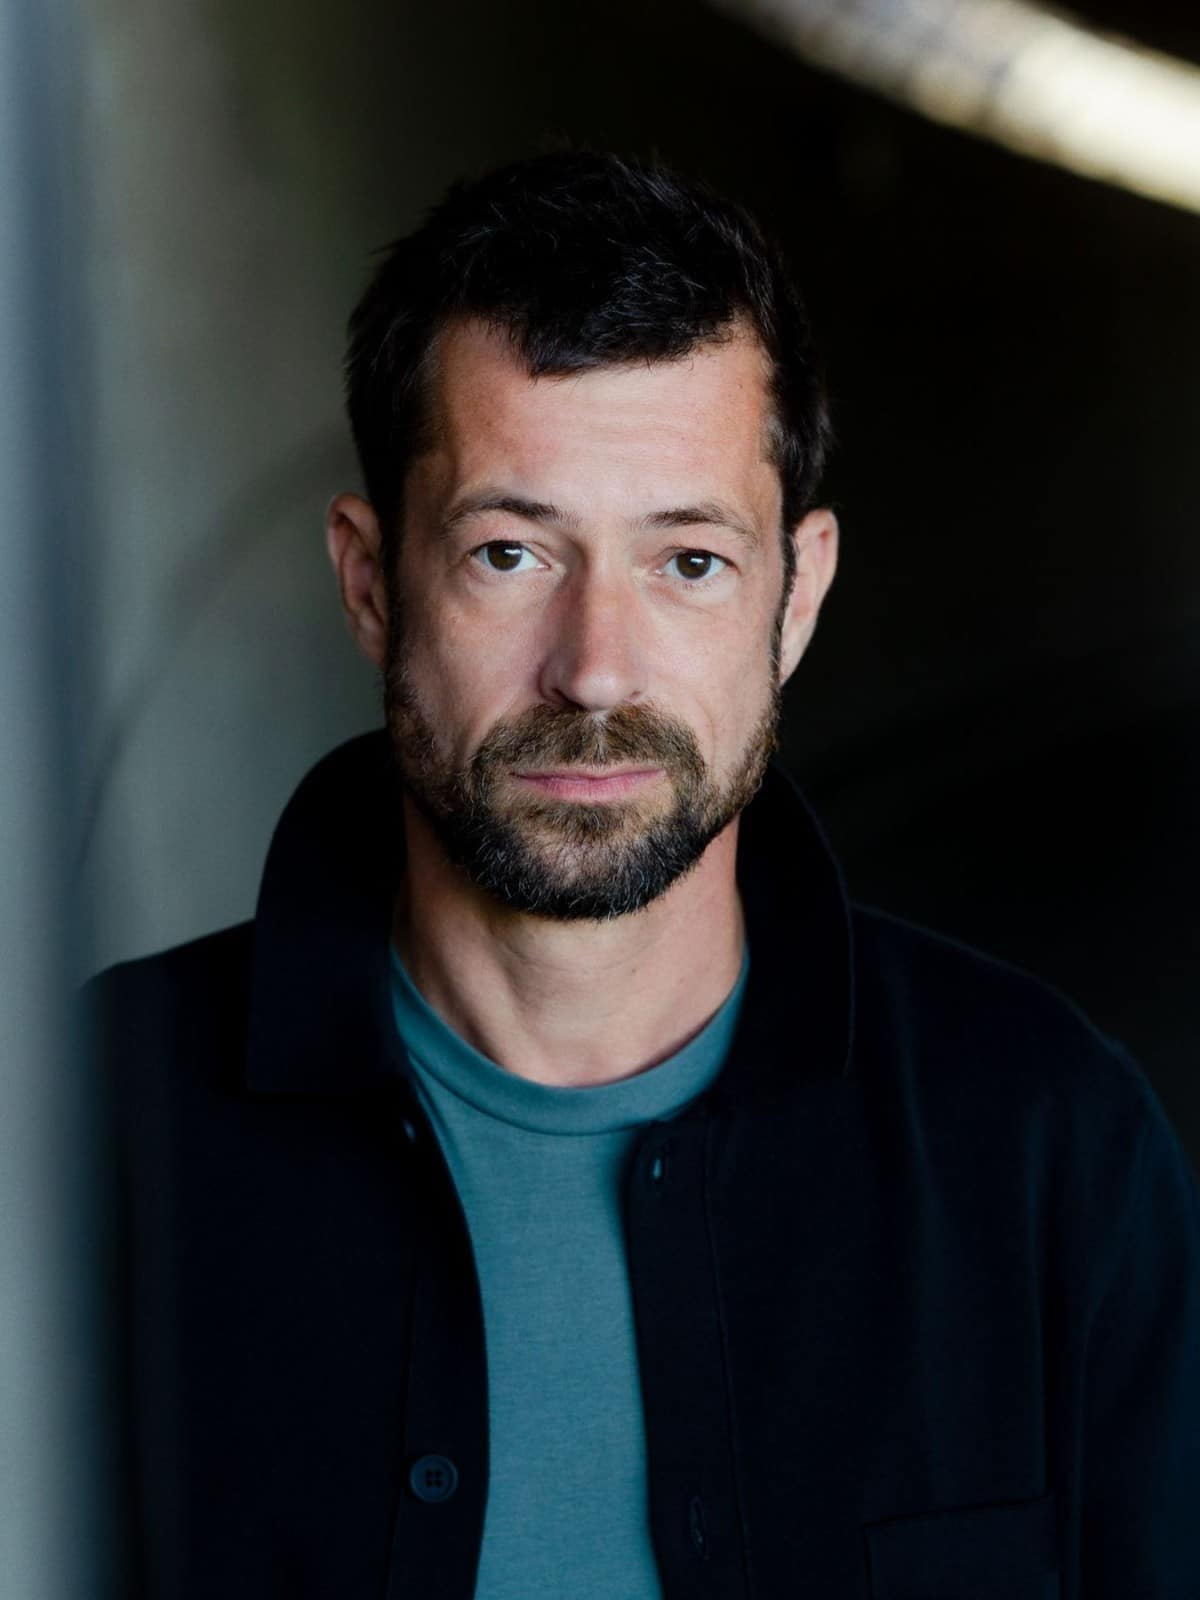 Jens Eulenberger, Schauspielagentur, Dreharbeiten